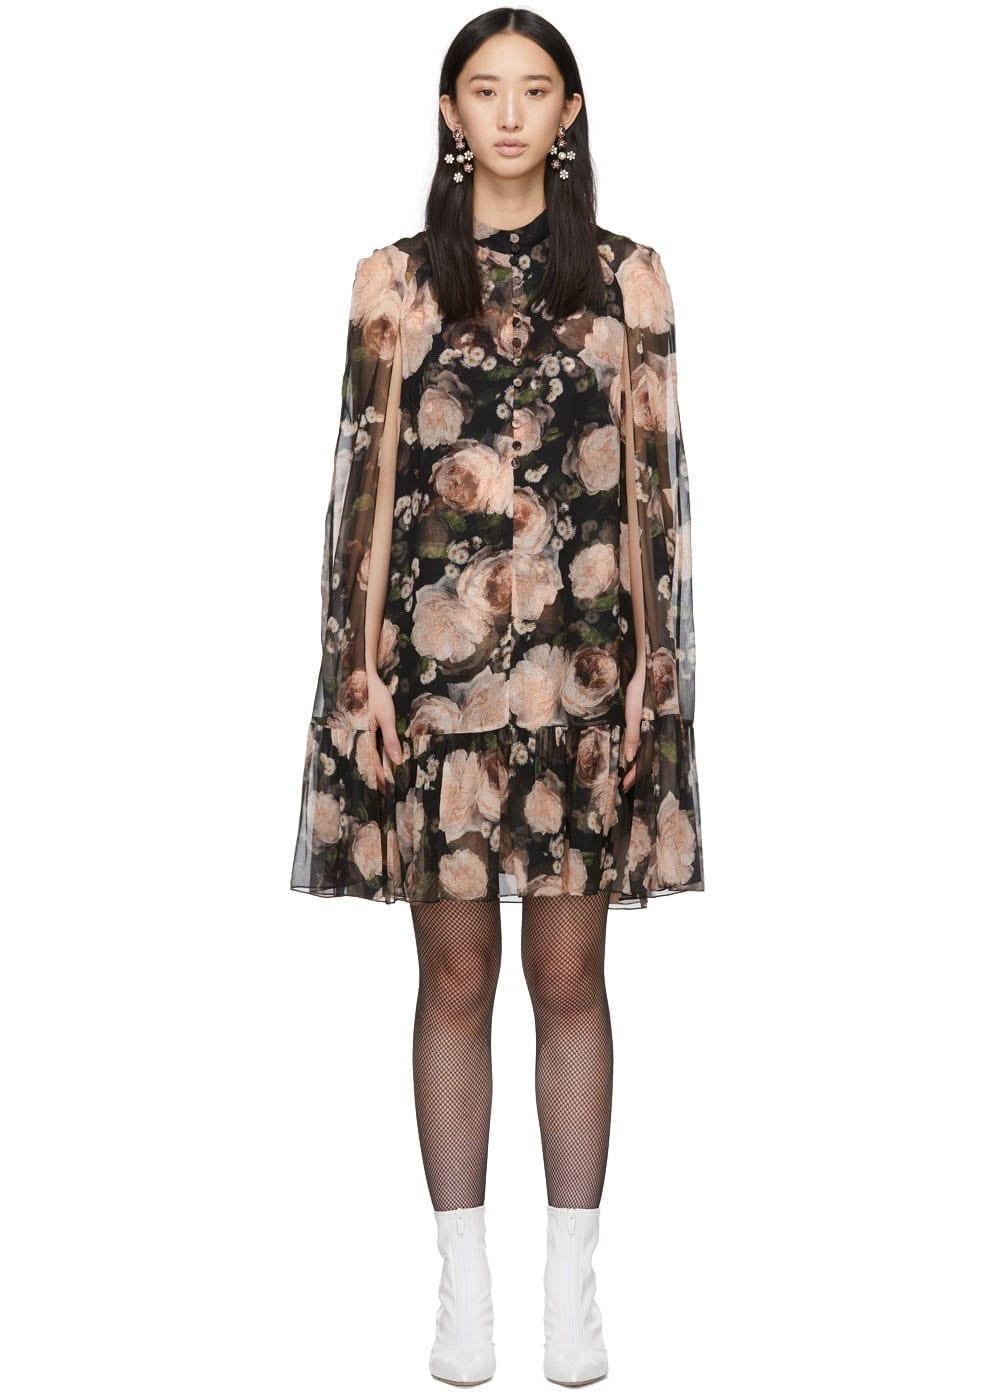 ERDEM Constantine Cape Black / Pink Dress